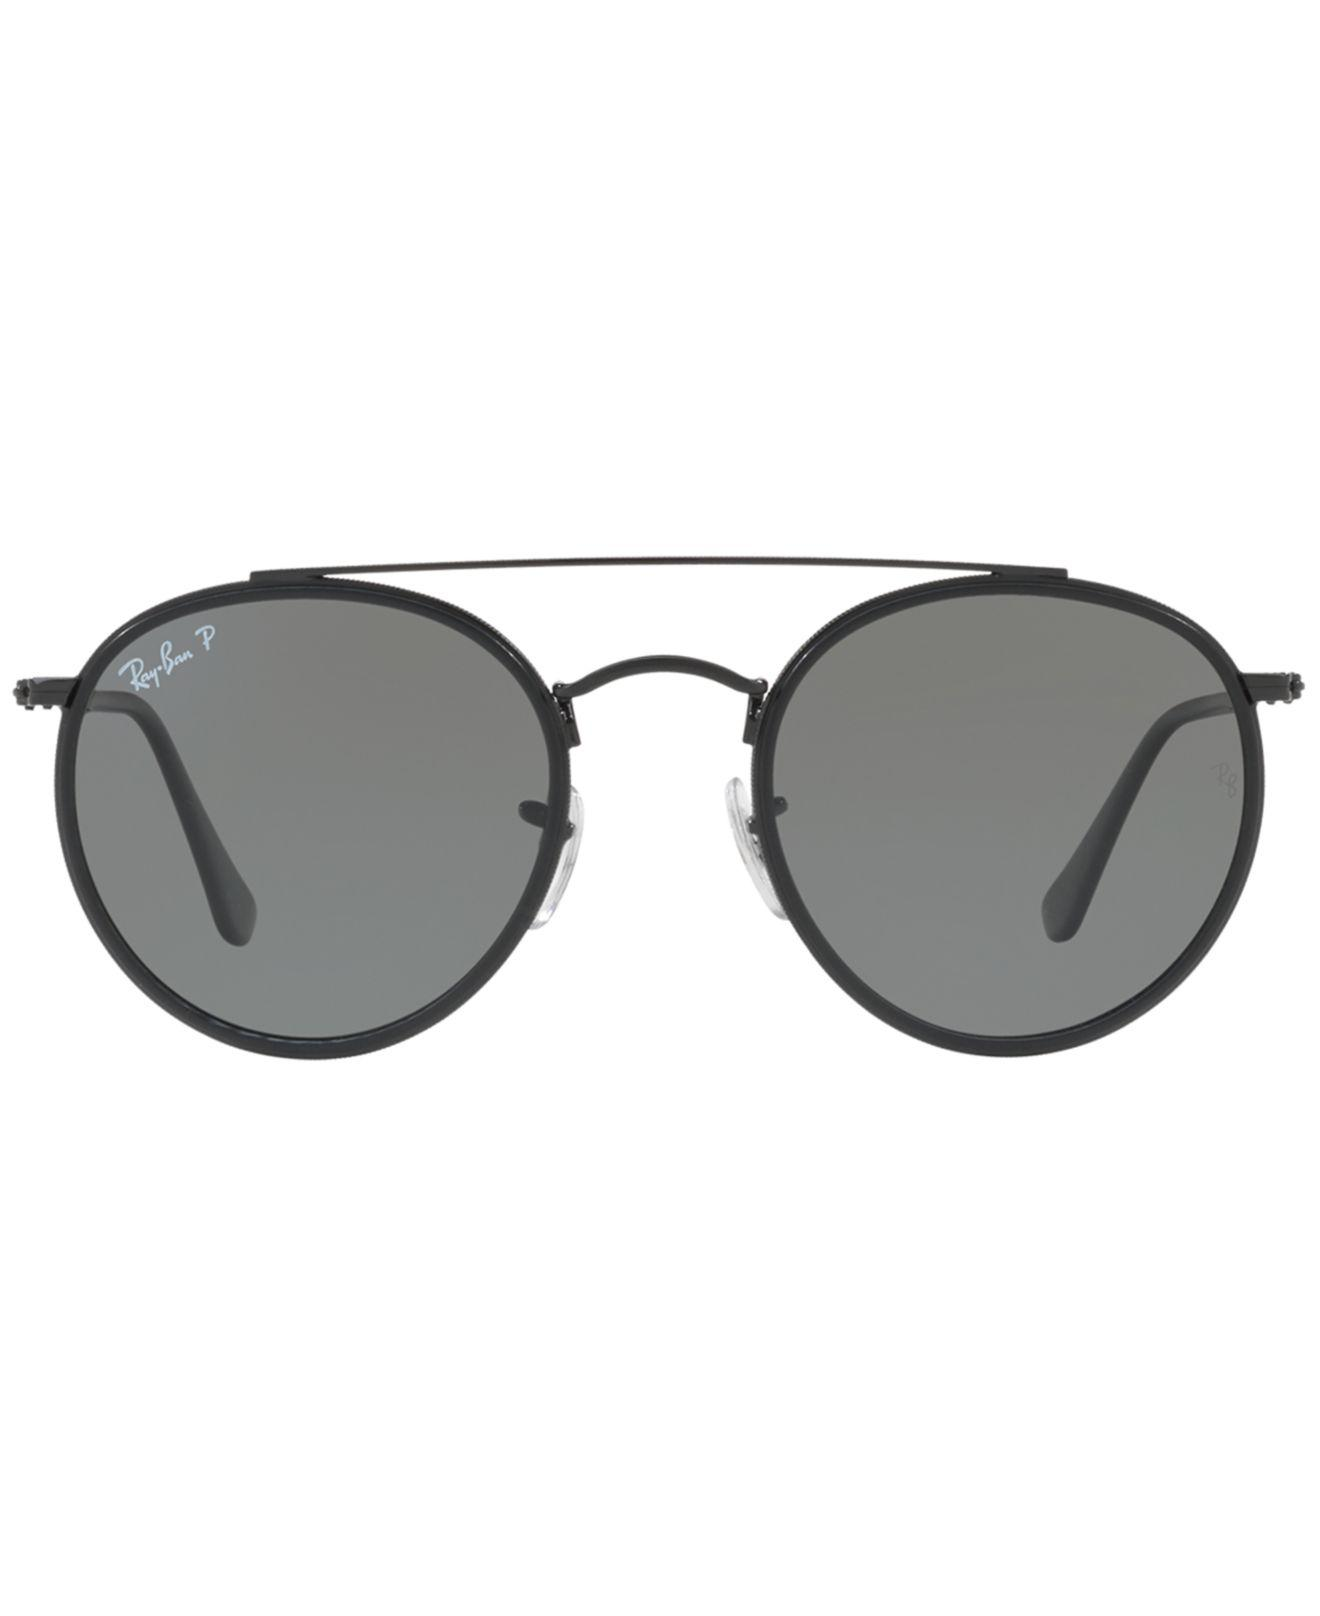 b51ff9c6be386 Ray-Ban Polarized Sunglasses